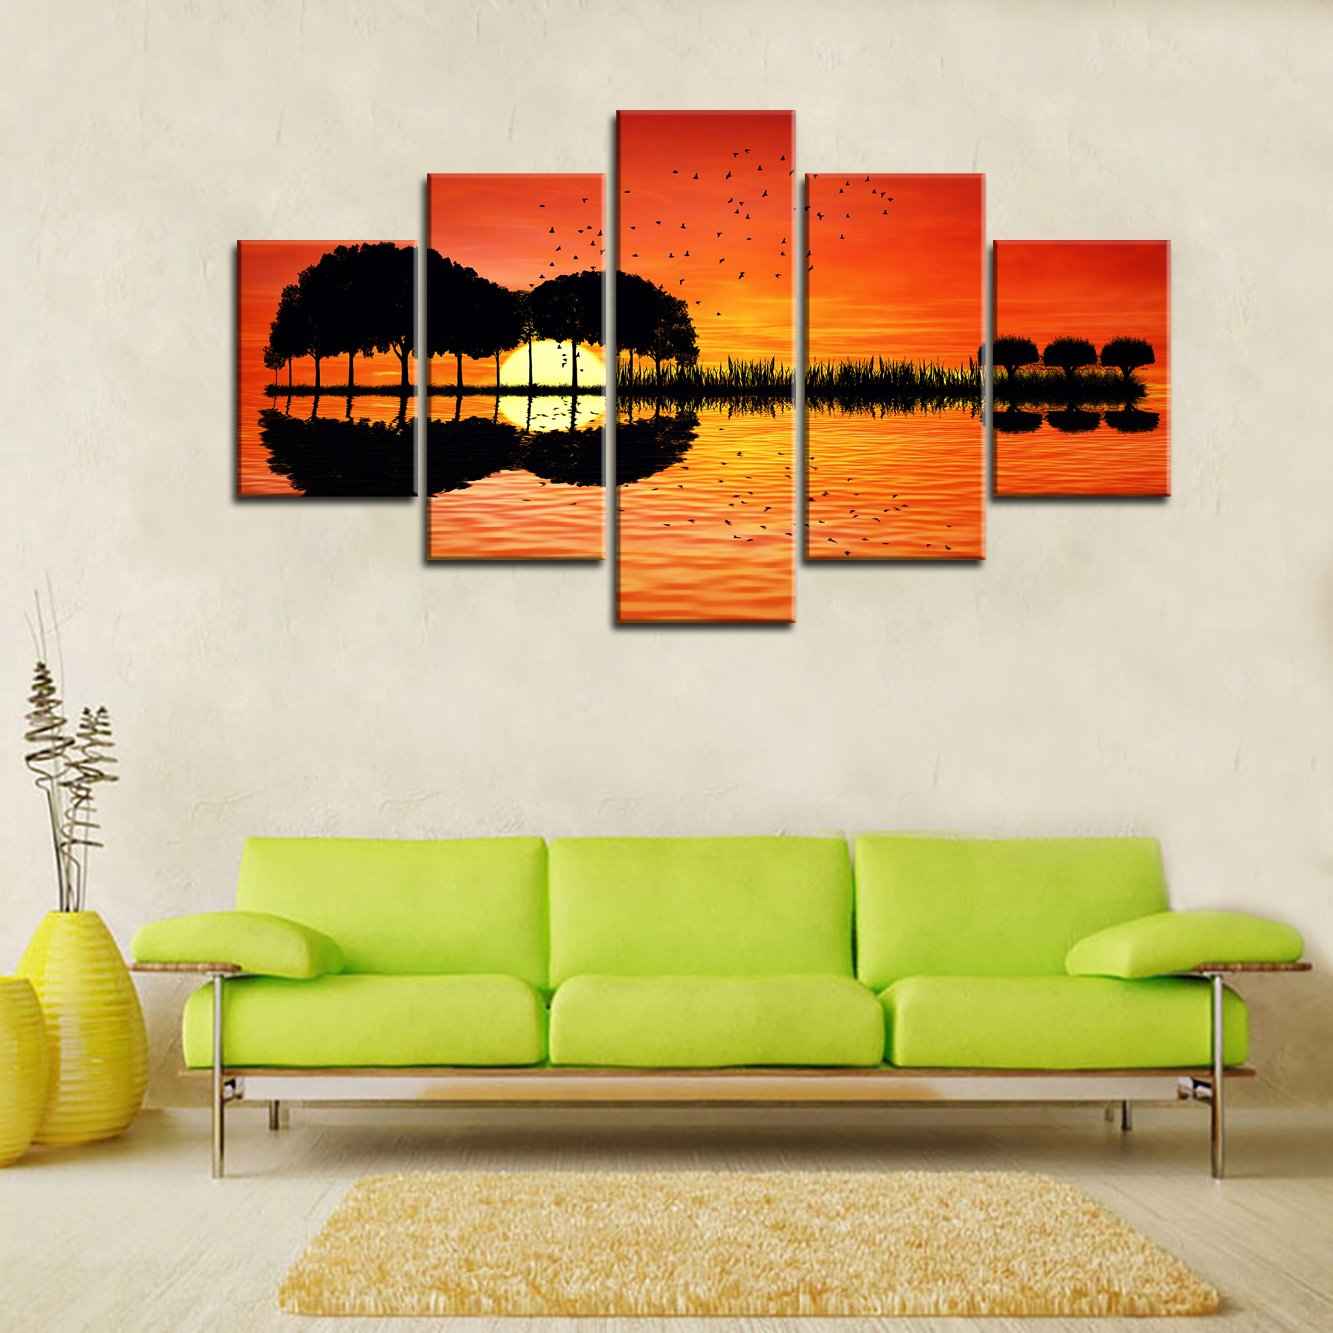 Amazon Com Music Wall Art Abstract Guitar Tree Orange Canvas Prints